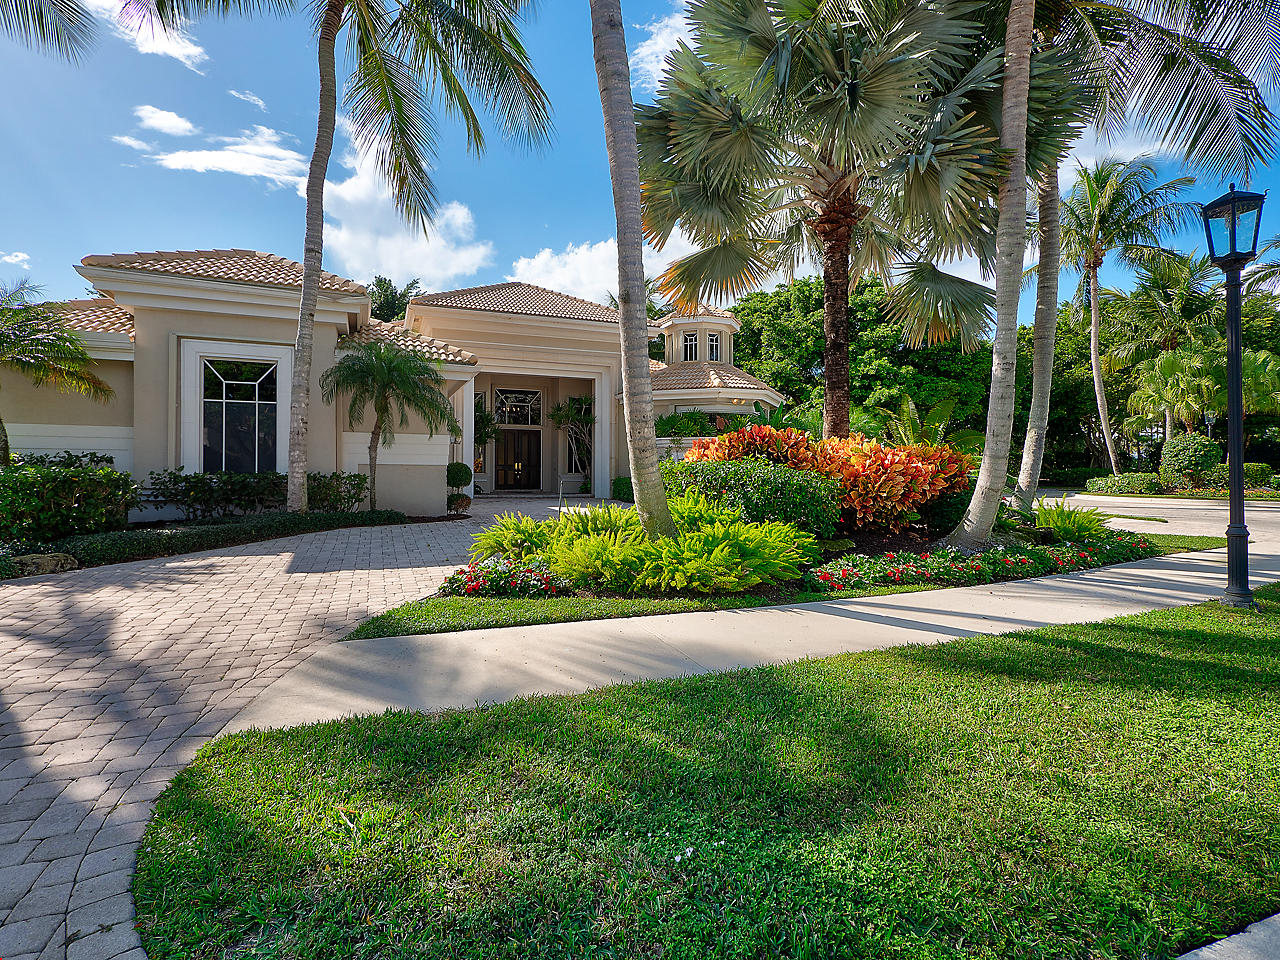 129 Saint Martin Drive, Palm Beach Gardens, Florida 33418, 3 Bedrooms Bedrooms, ,3.2 BathroomsBathrooms,A,Single family,Saint Martin,RX-10581883